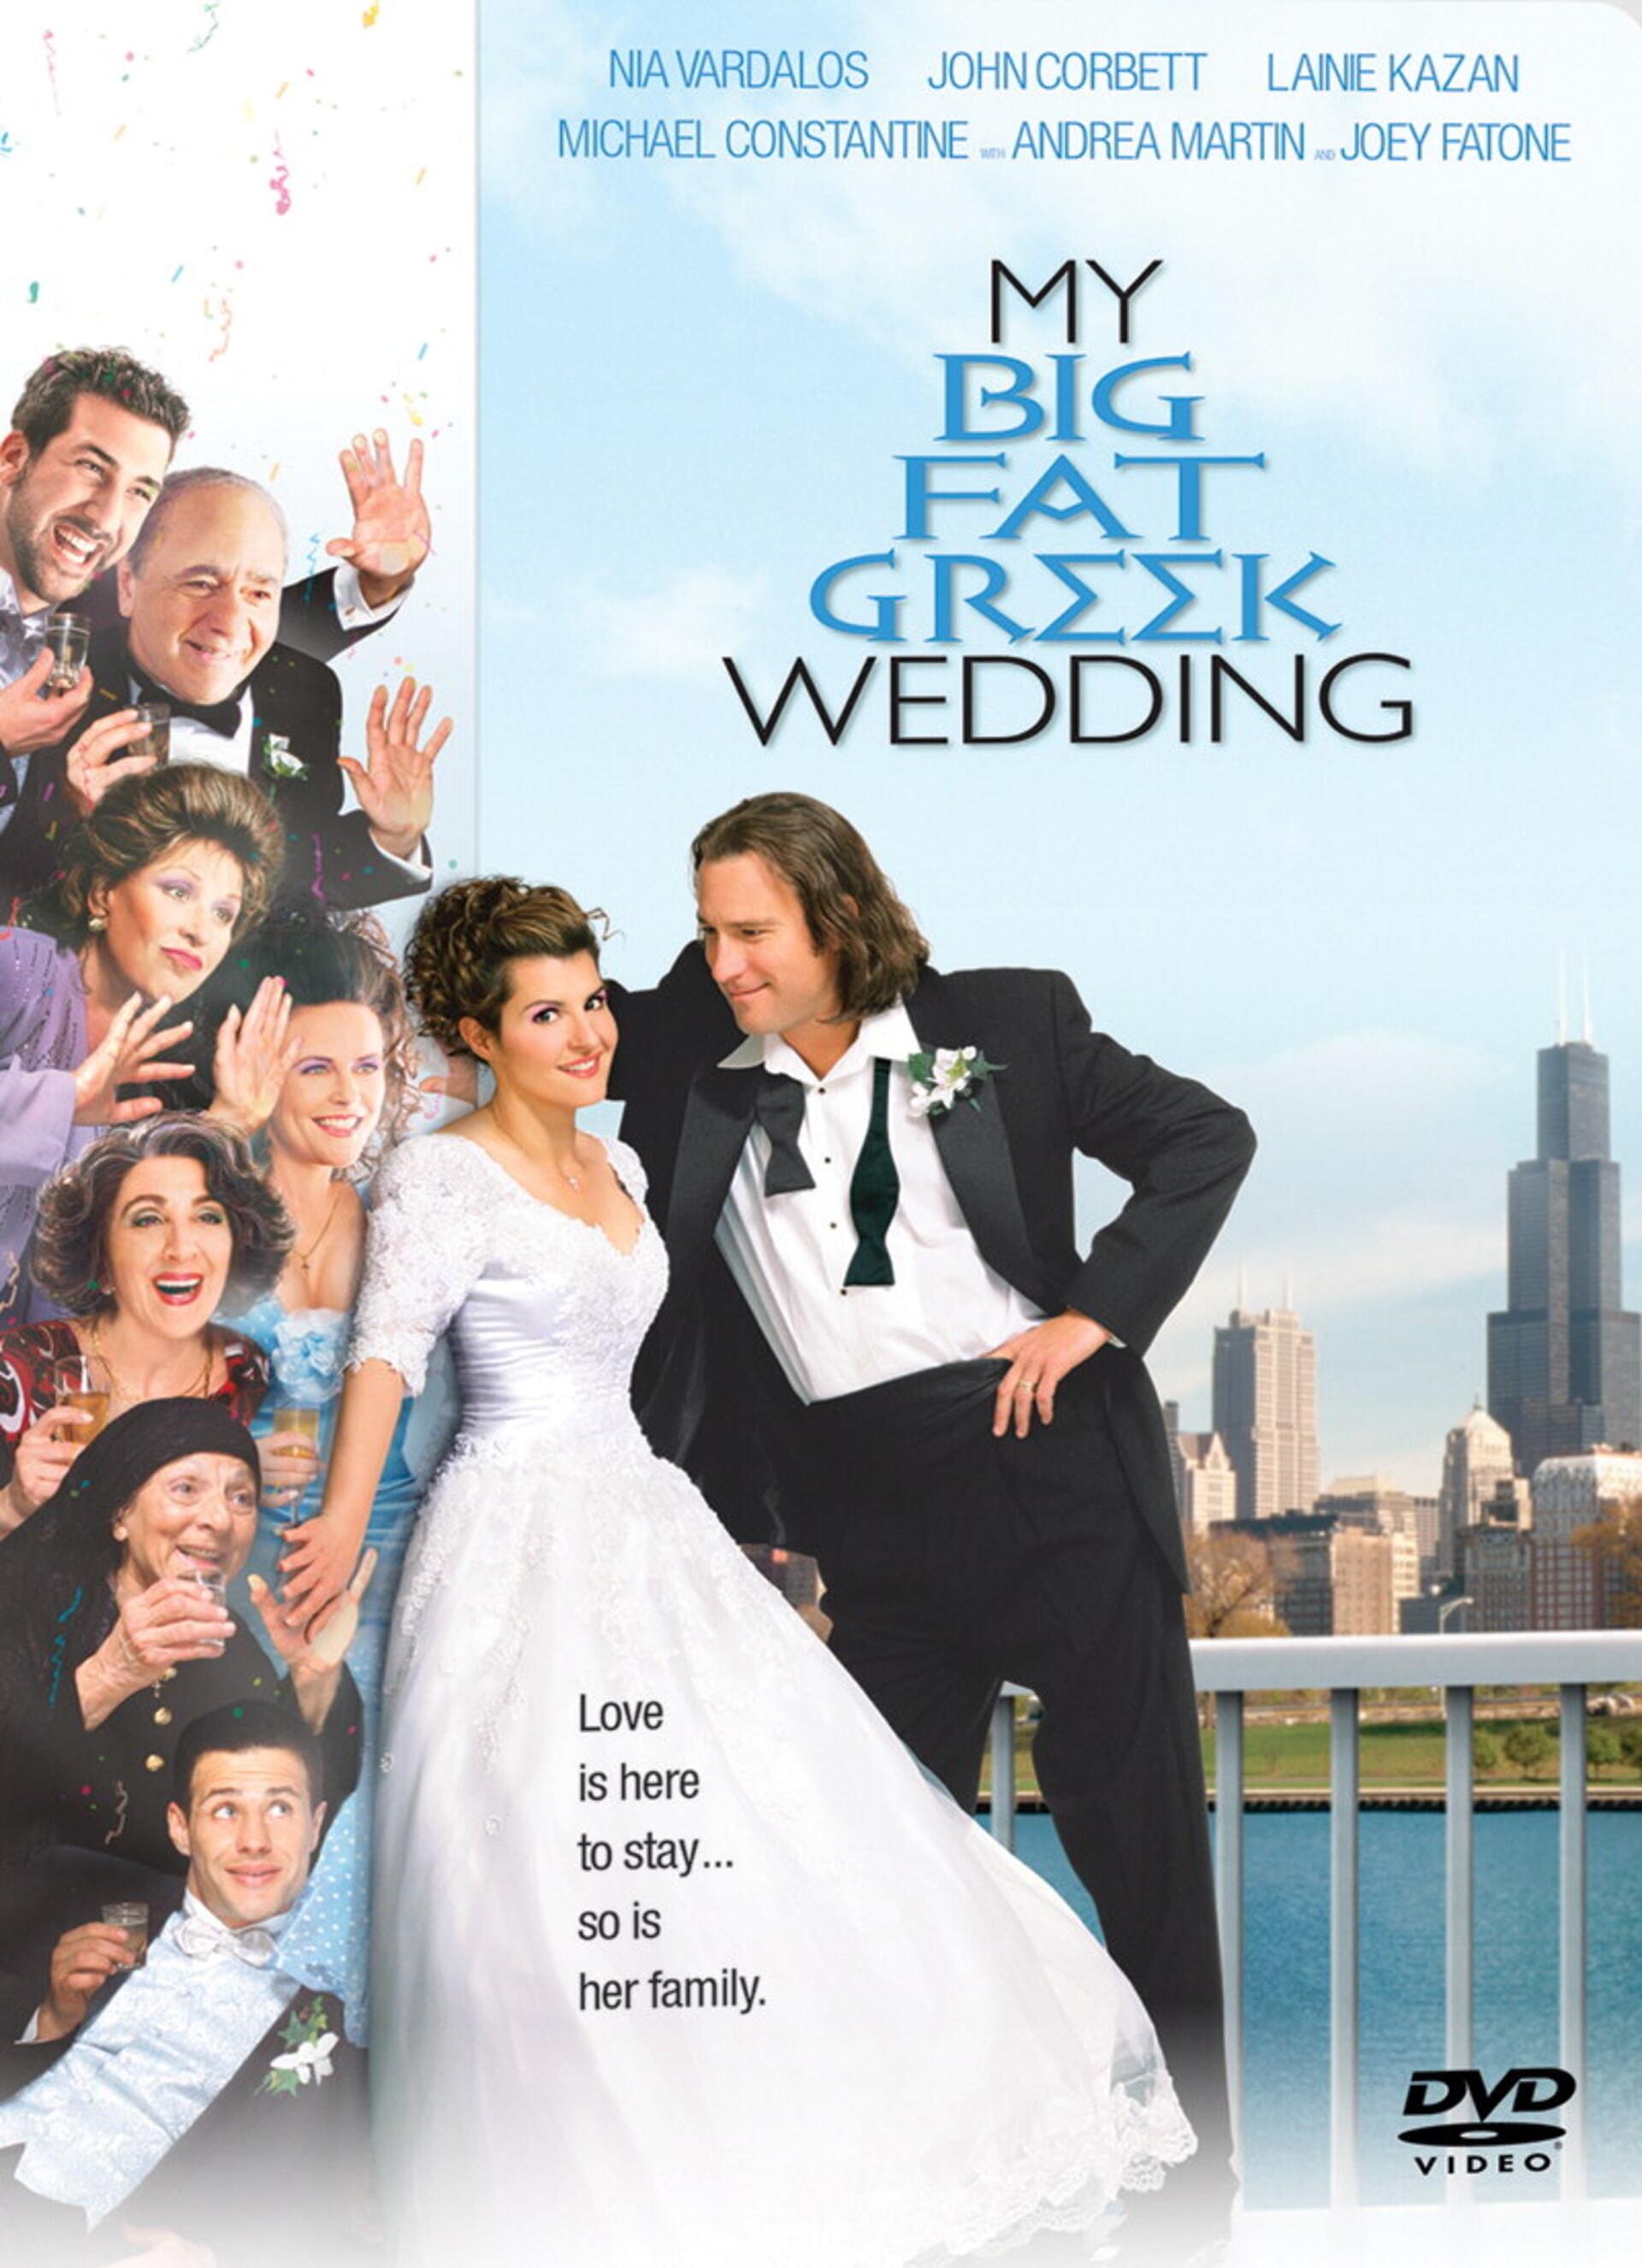 My Big Fat Greek Wedding - Poster 1